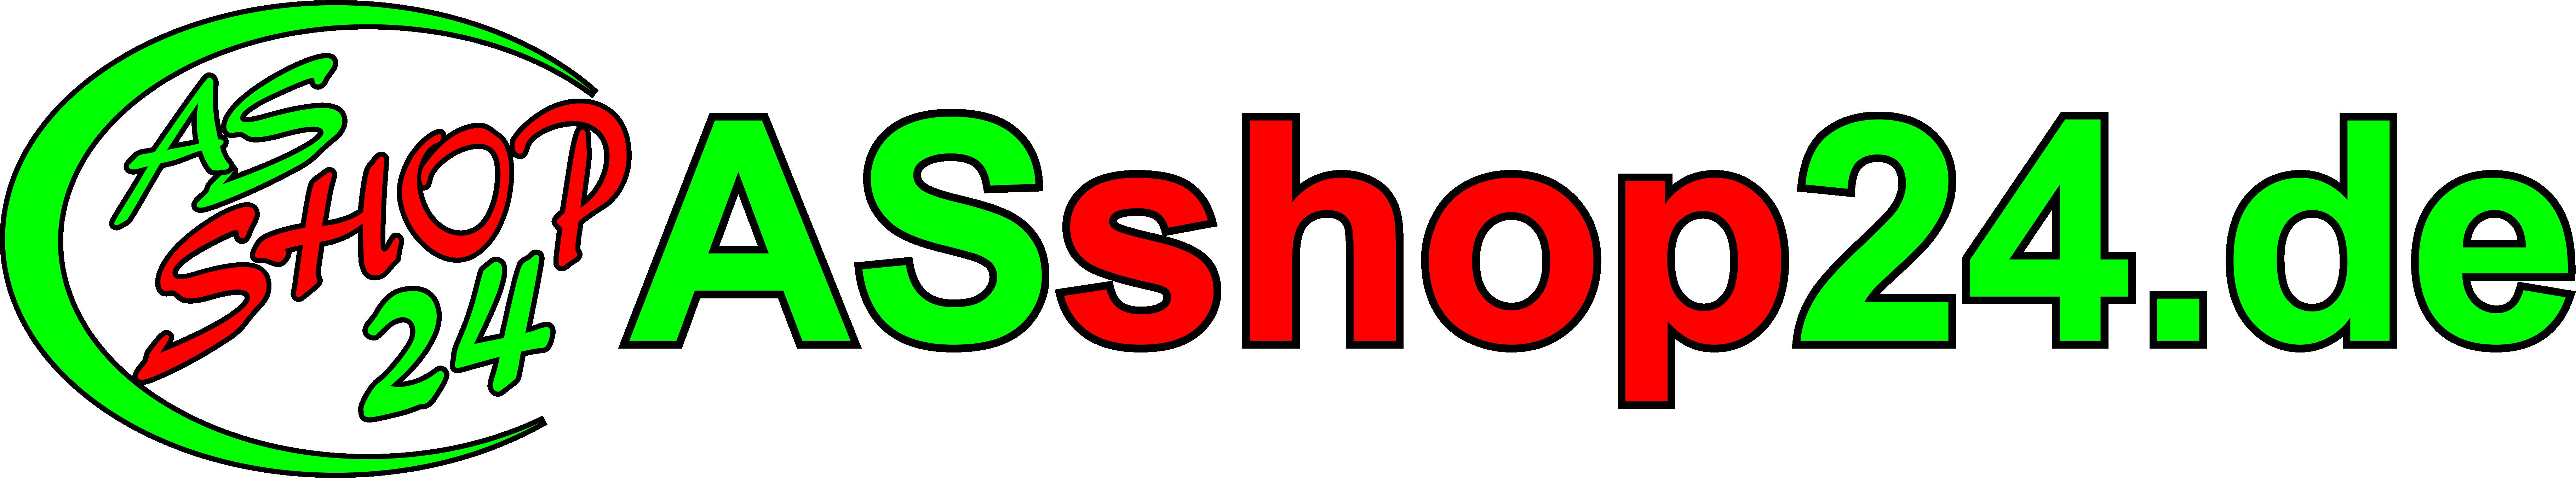 ASshop24.de-Logo